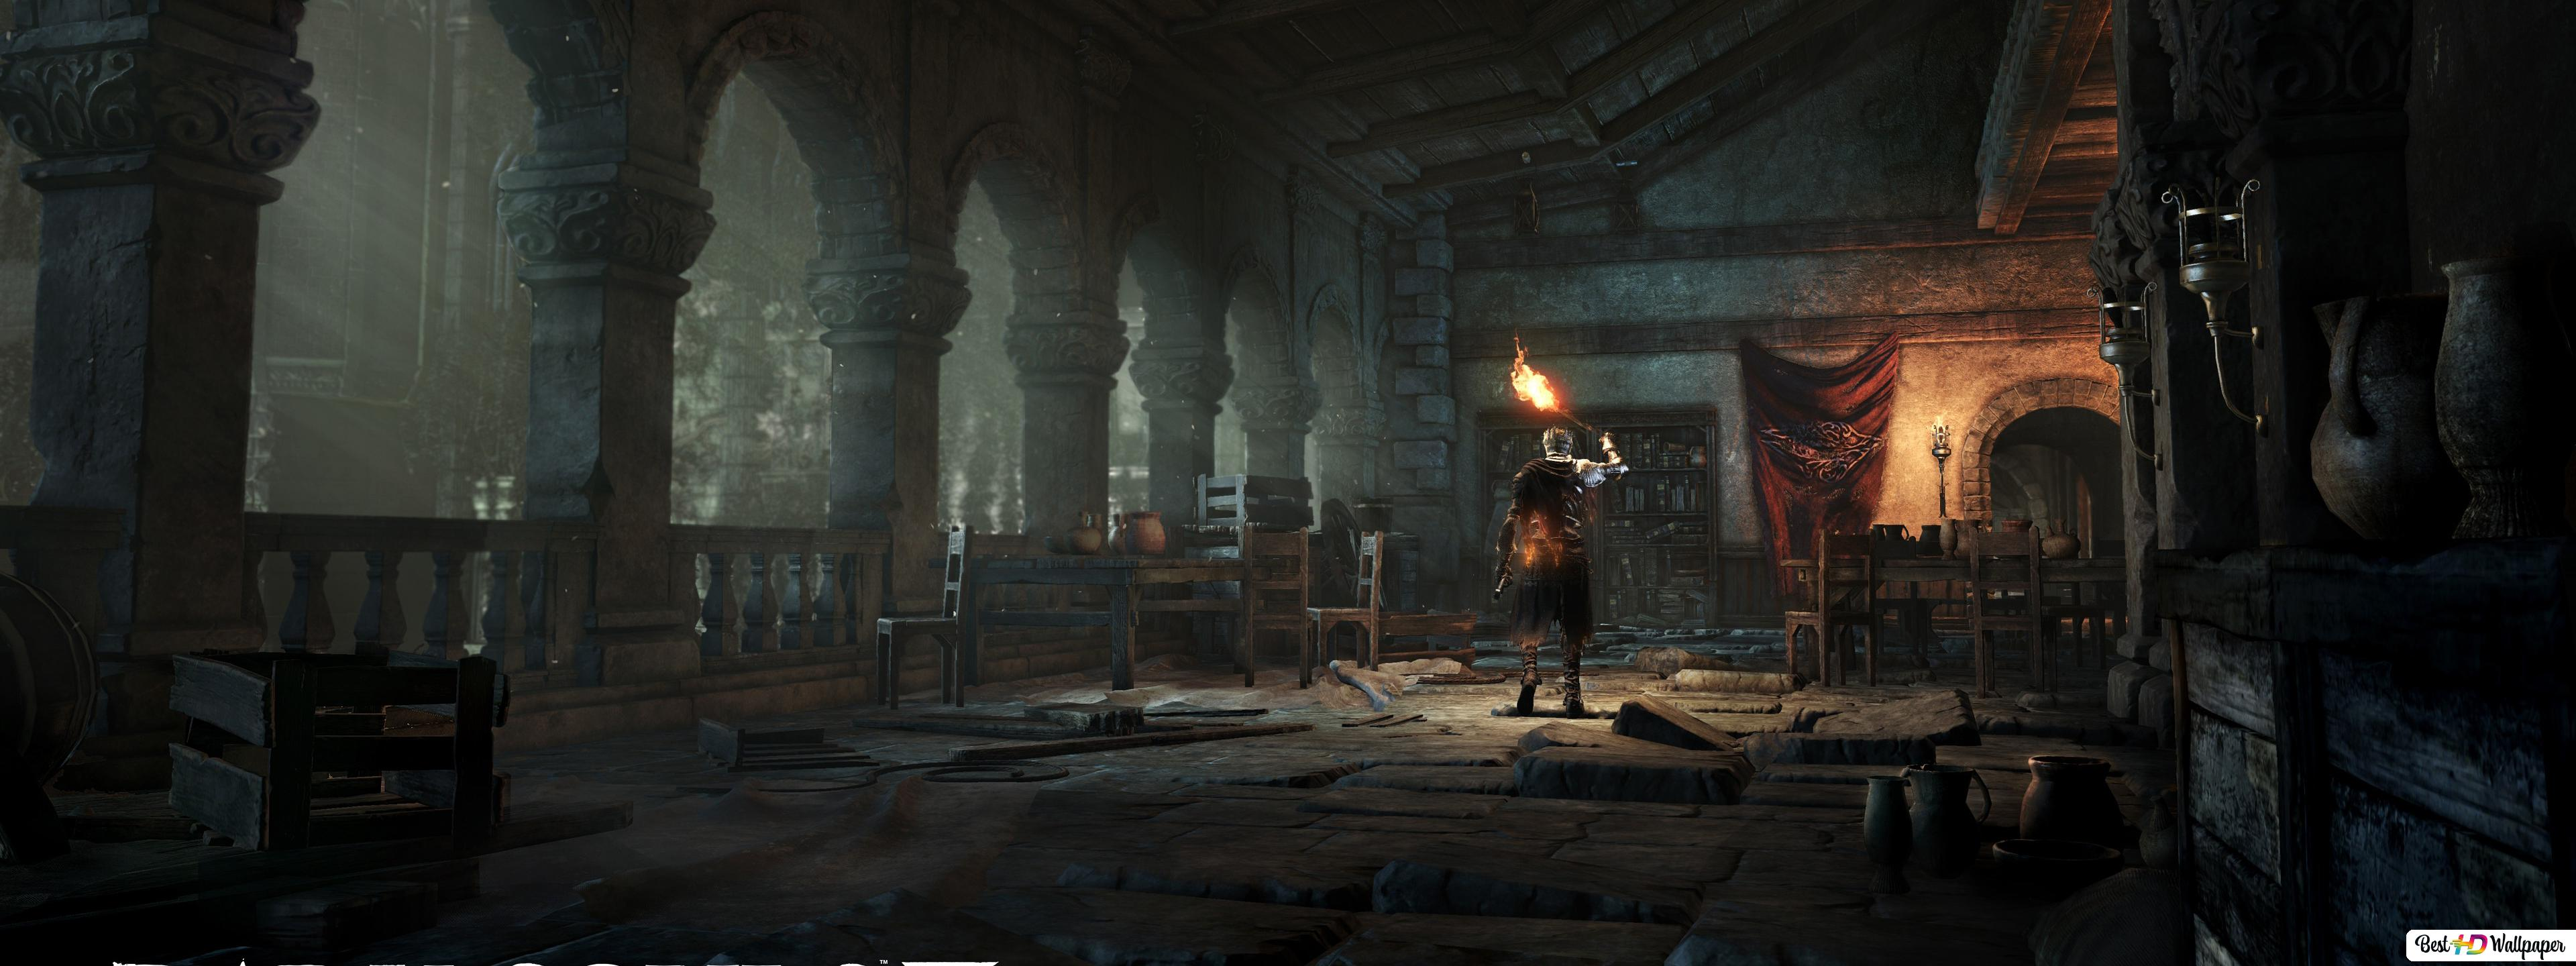 Dark Souls Iii Satellite Award Winning Game Hd Wallpaper Download